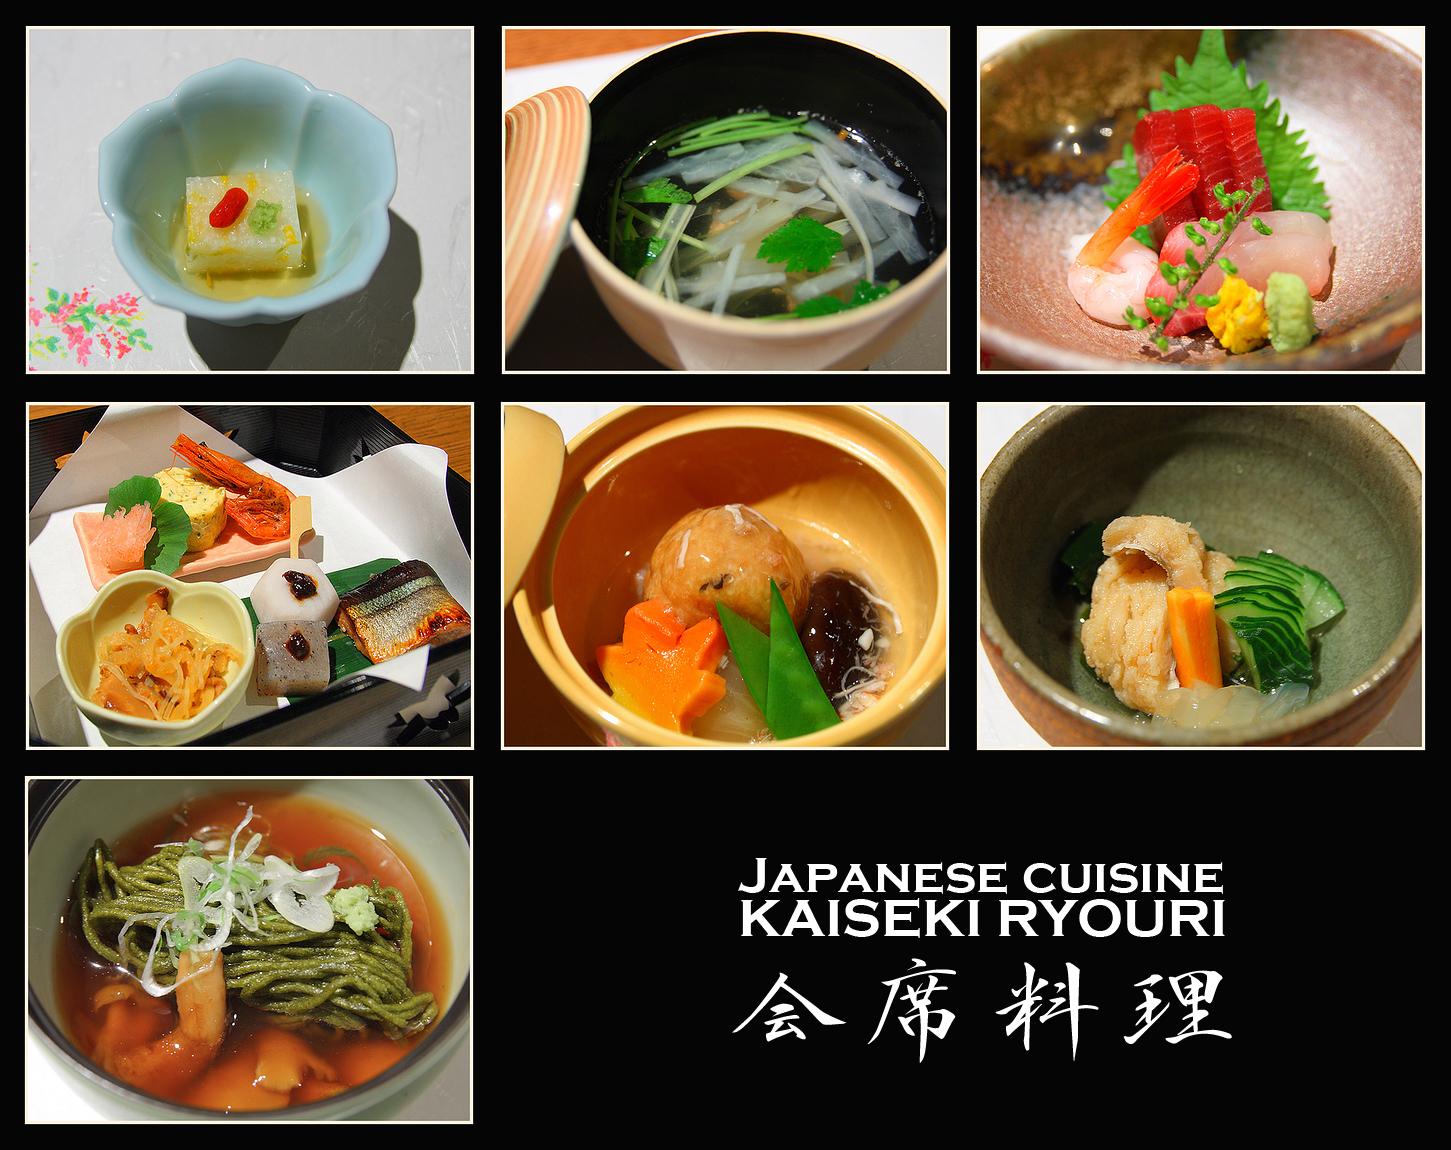 kaiseki cucina giapponese